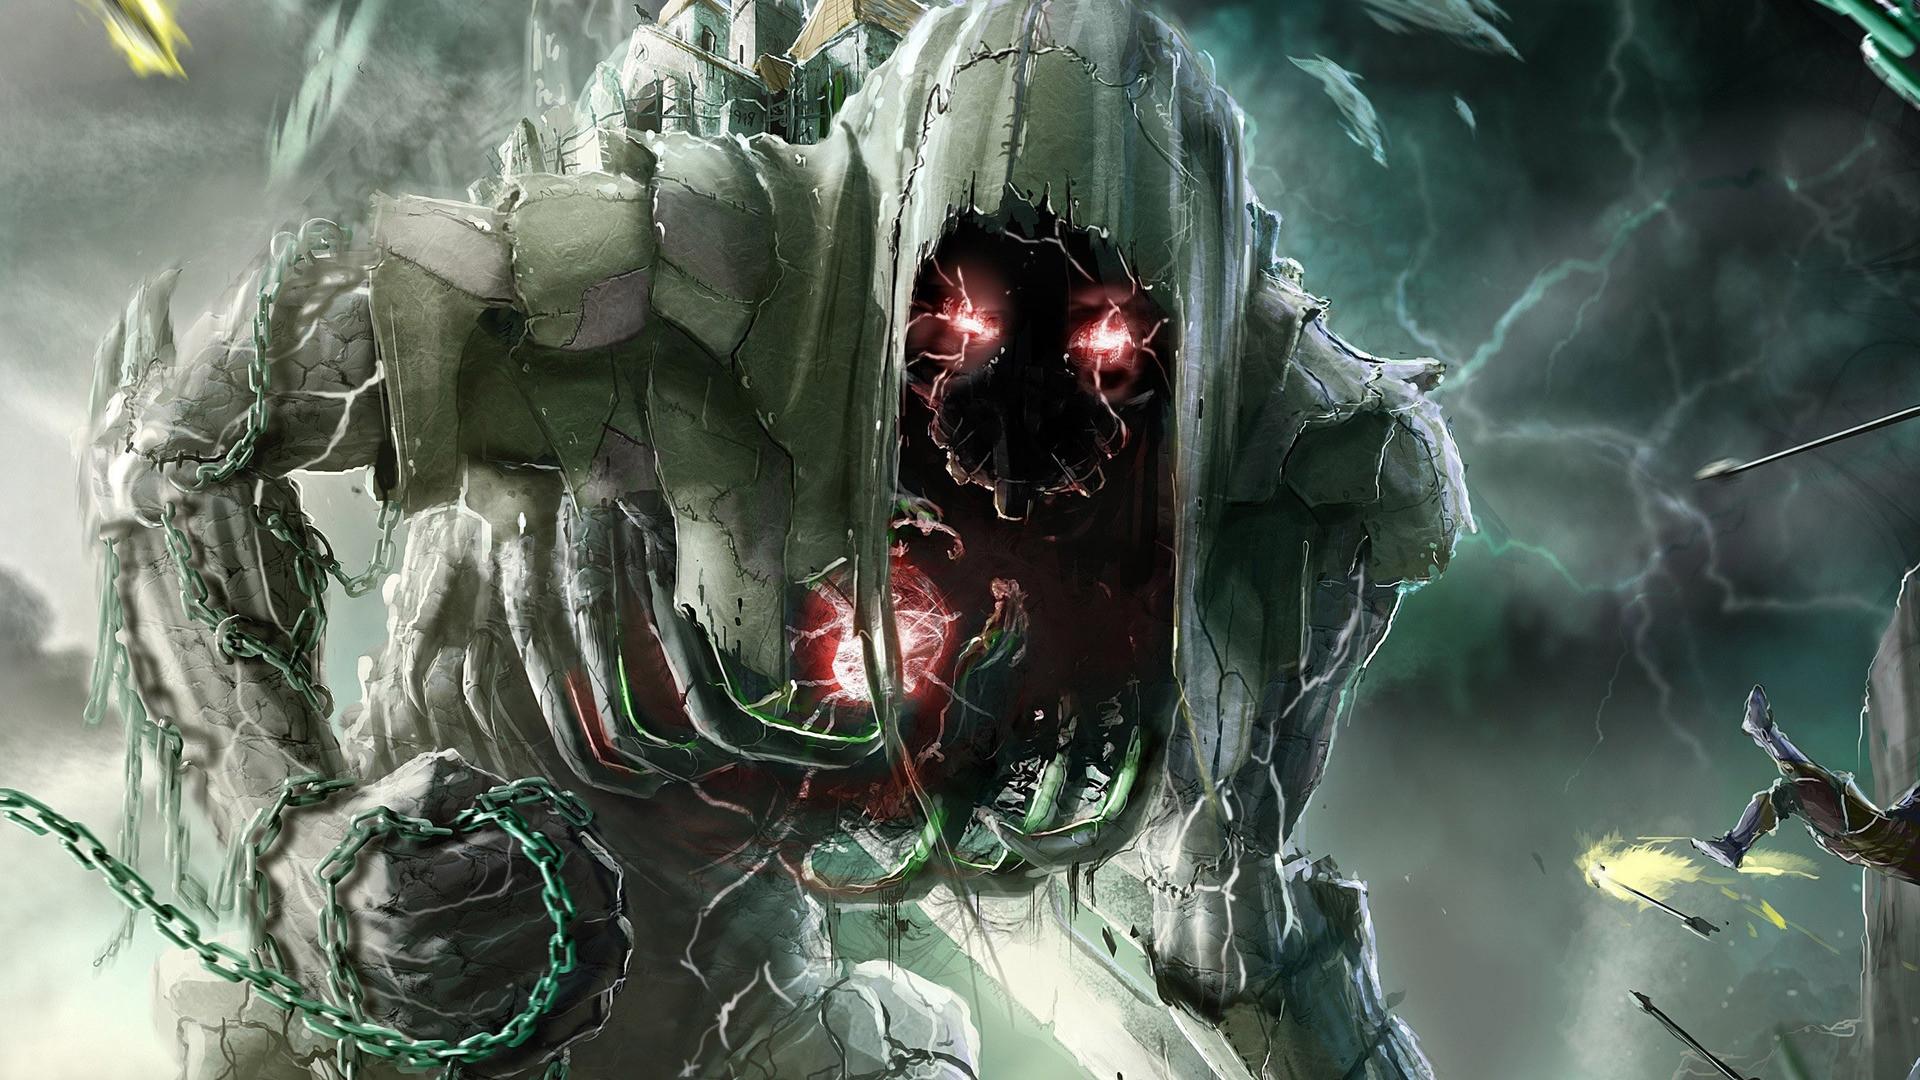 Creepy Hd Wallpaper: Scary Demon Wallpaper (59+ Images